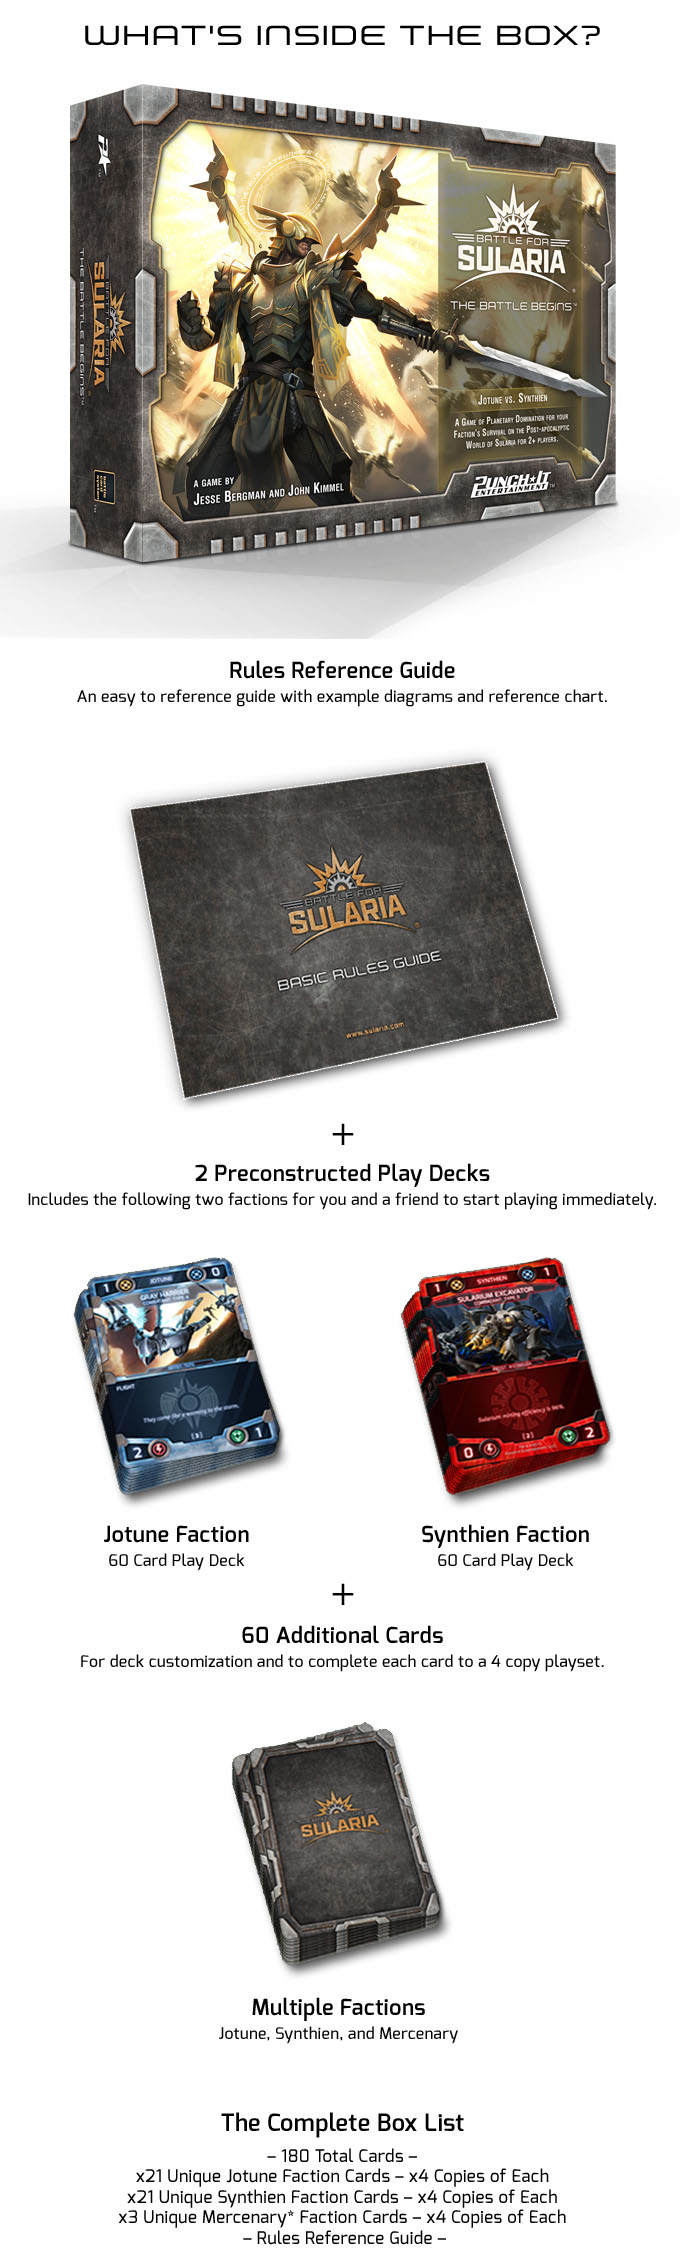 Battle for Sularia Battle Kit